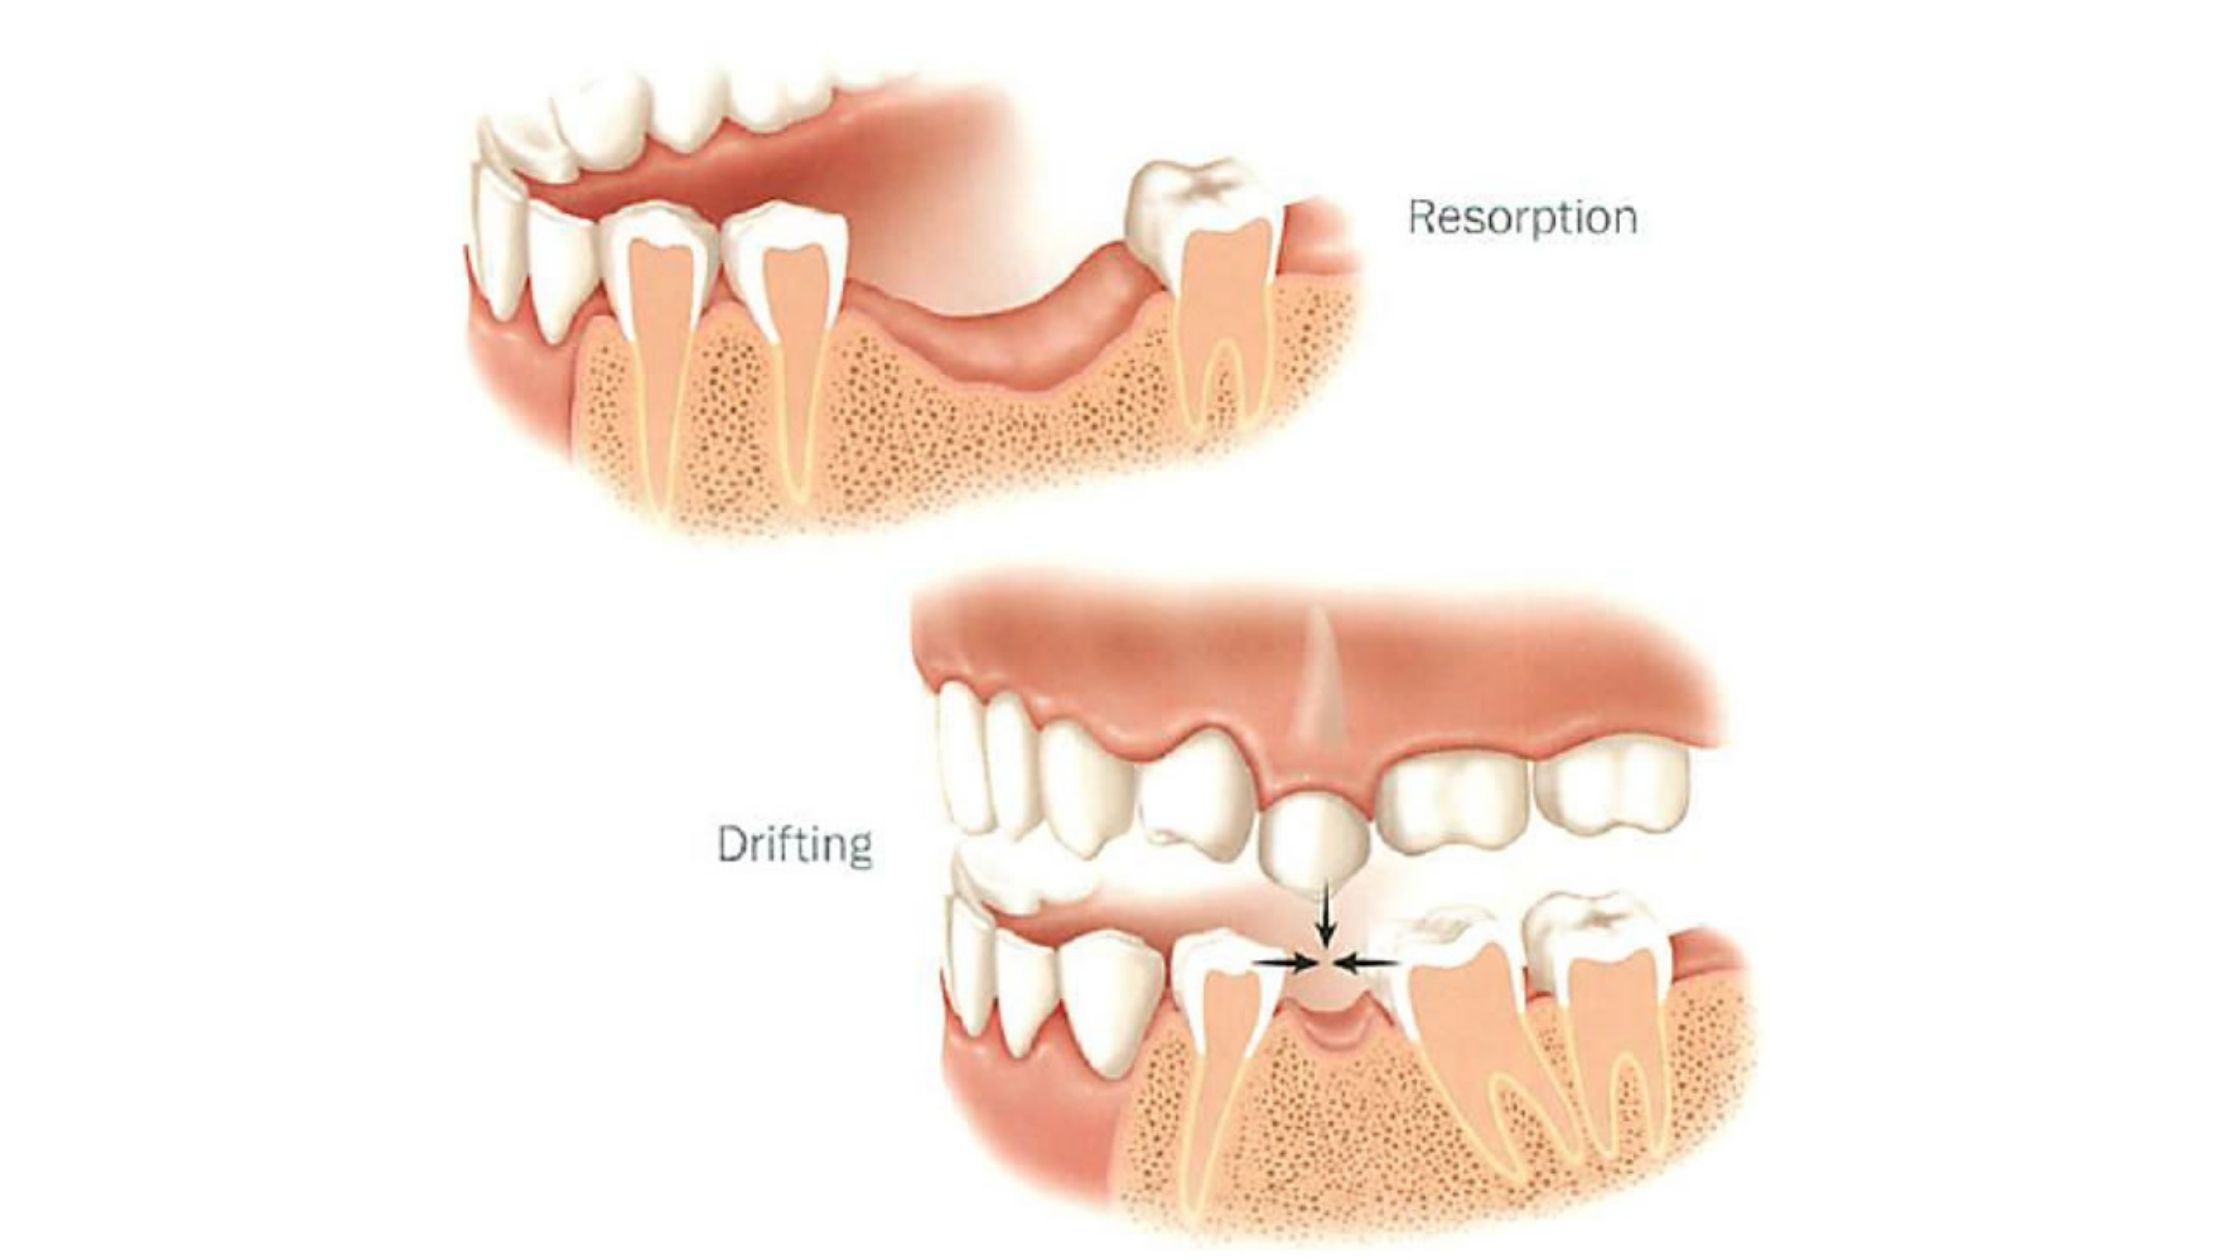 Effects of bone resorption on oral health